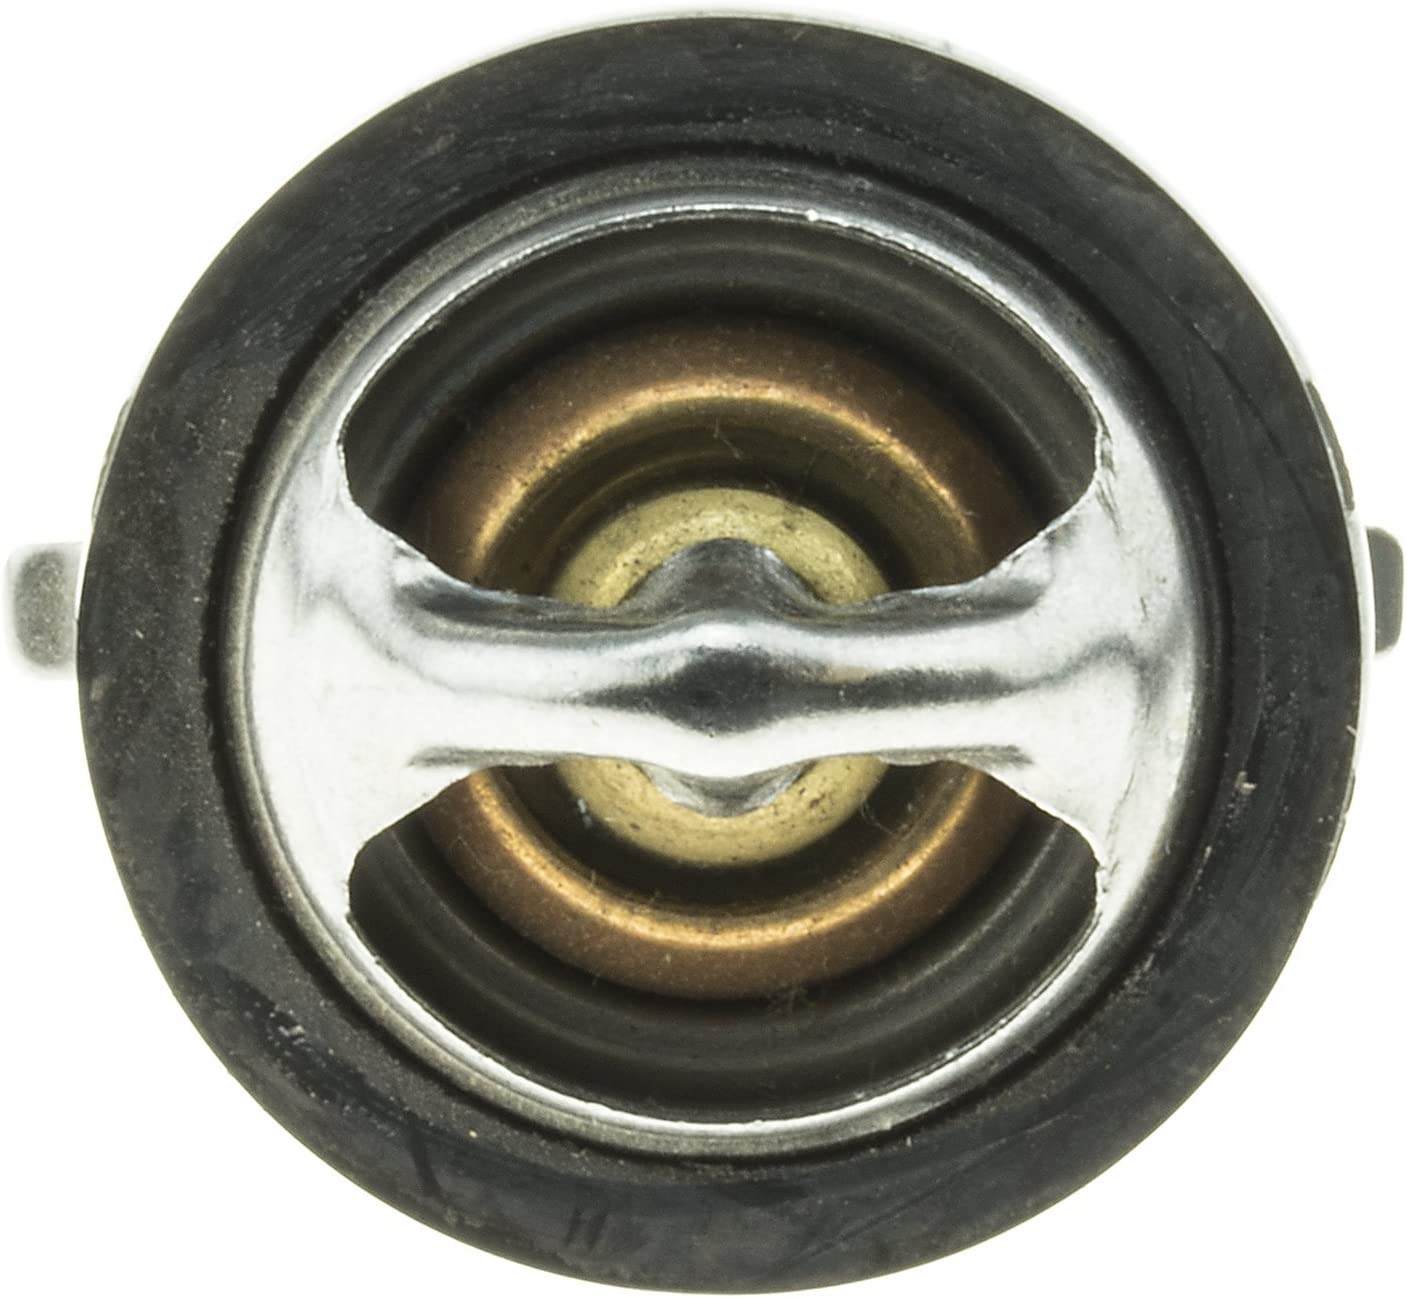 MotoRad 7207-160 Fail-Safe Thermostat